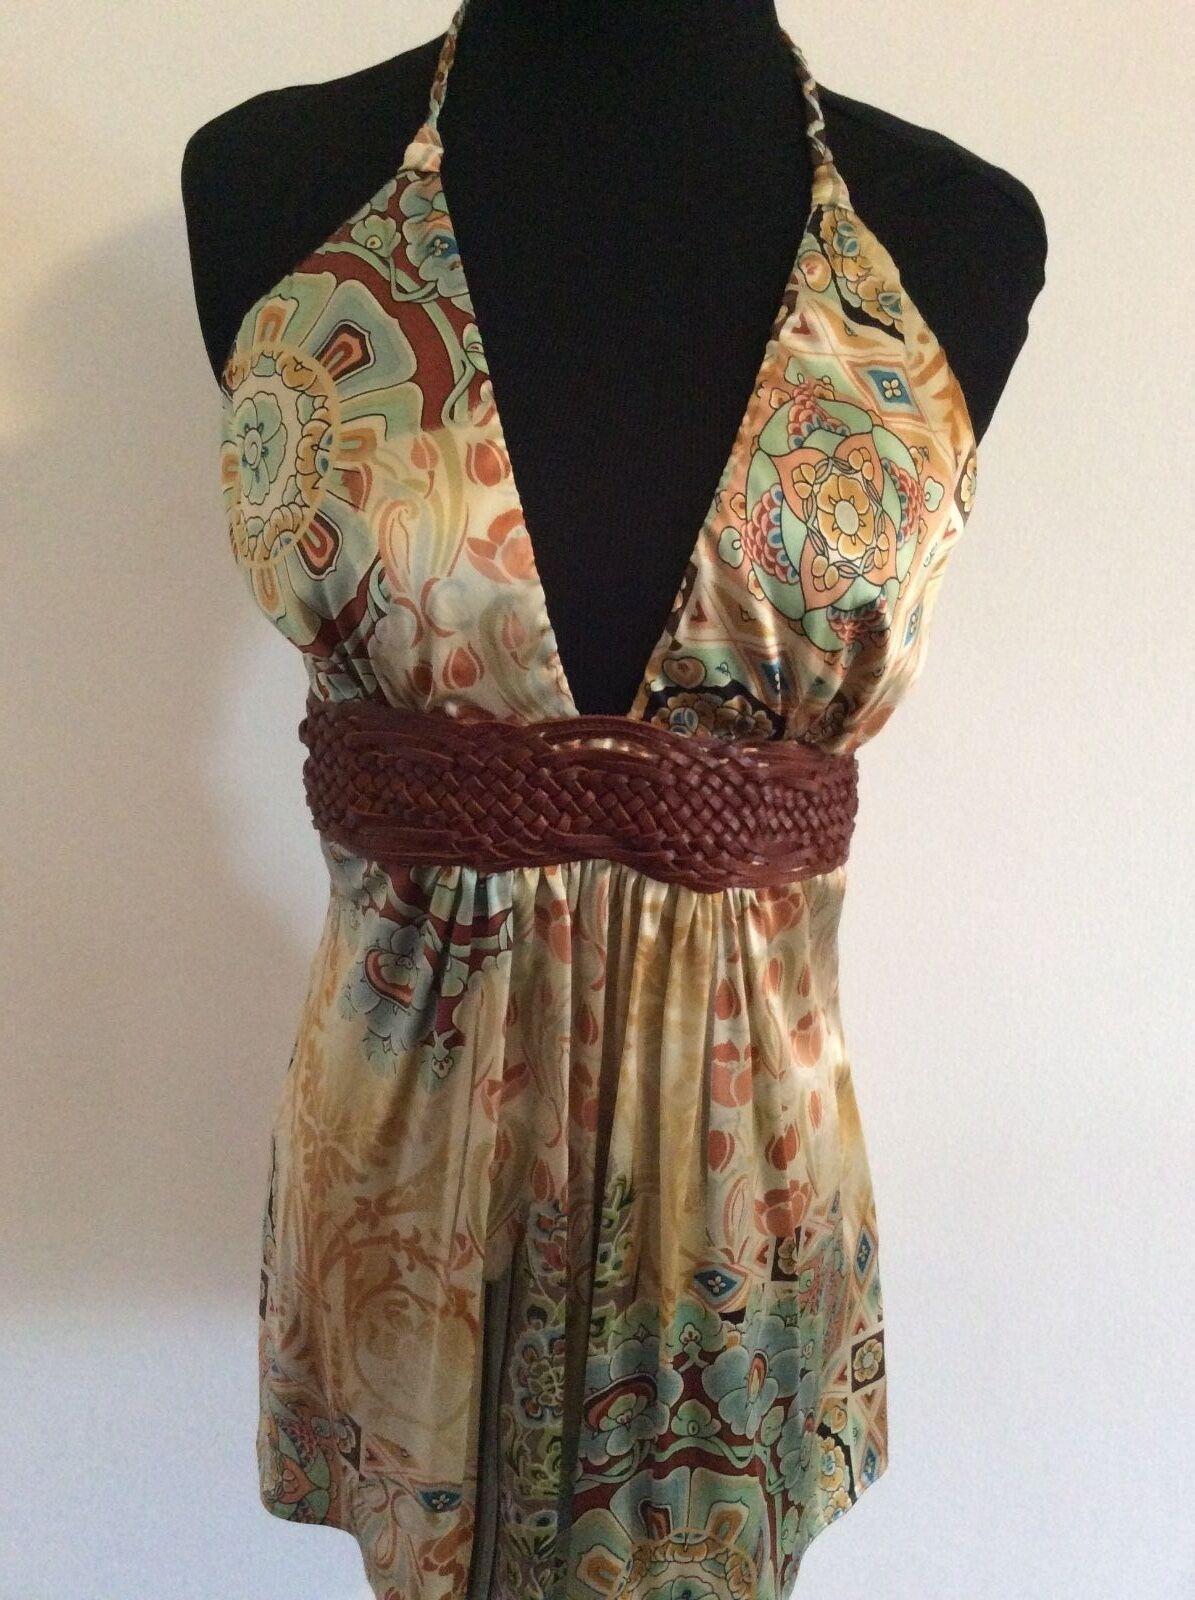 NWT SKY NEW silk halter top leather braid accent L Large ladies elegant